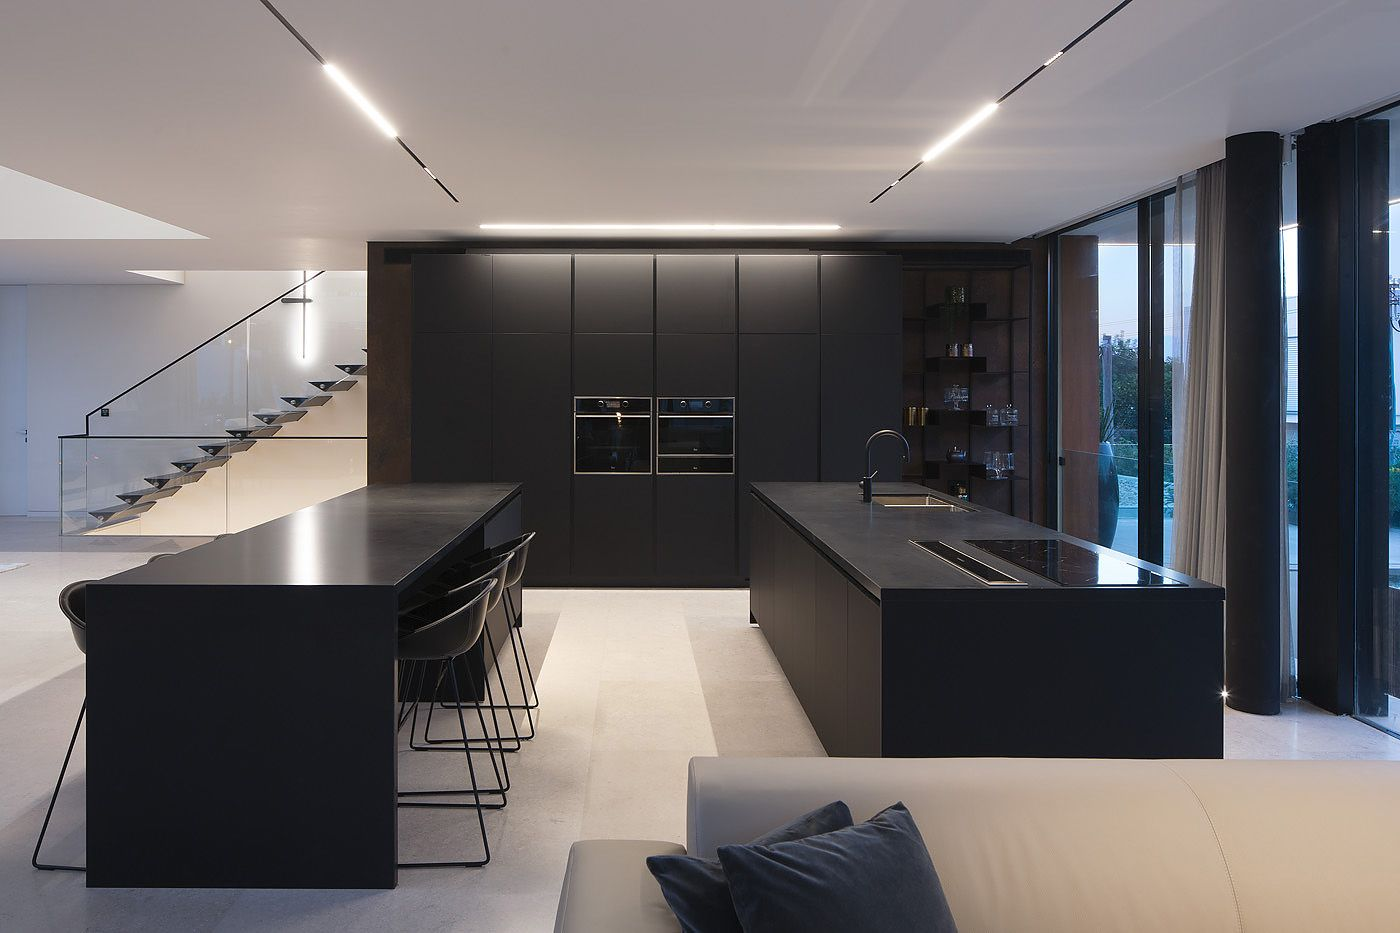 Flua Israel Residential Lighting Solutions Kitchen Dining